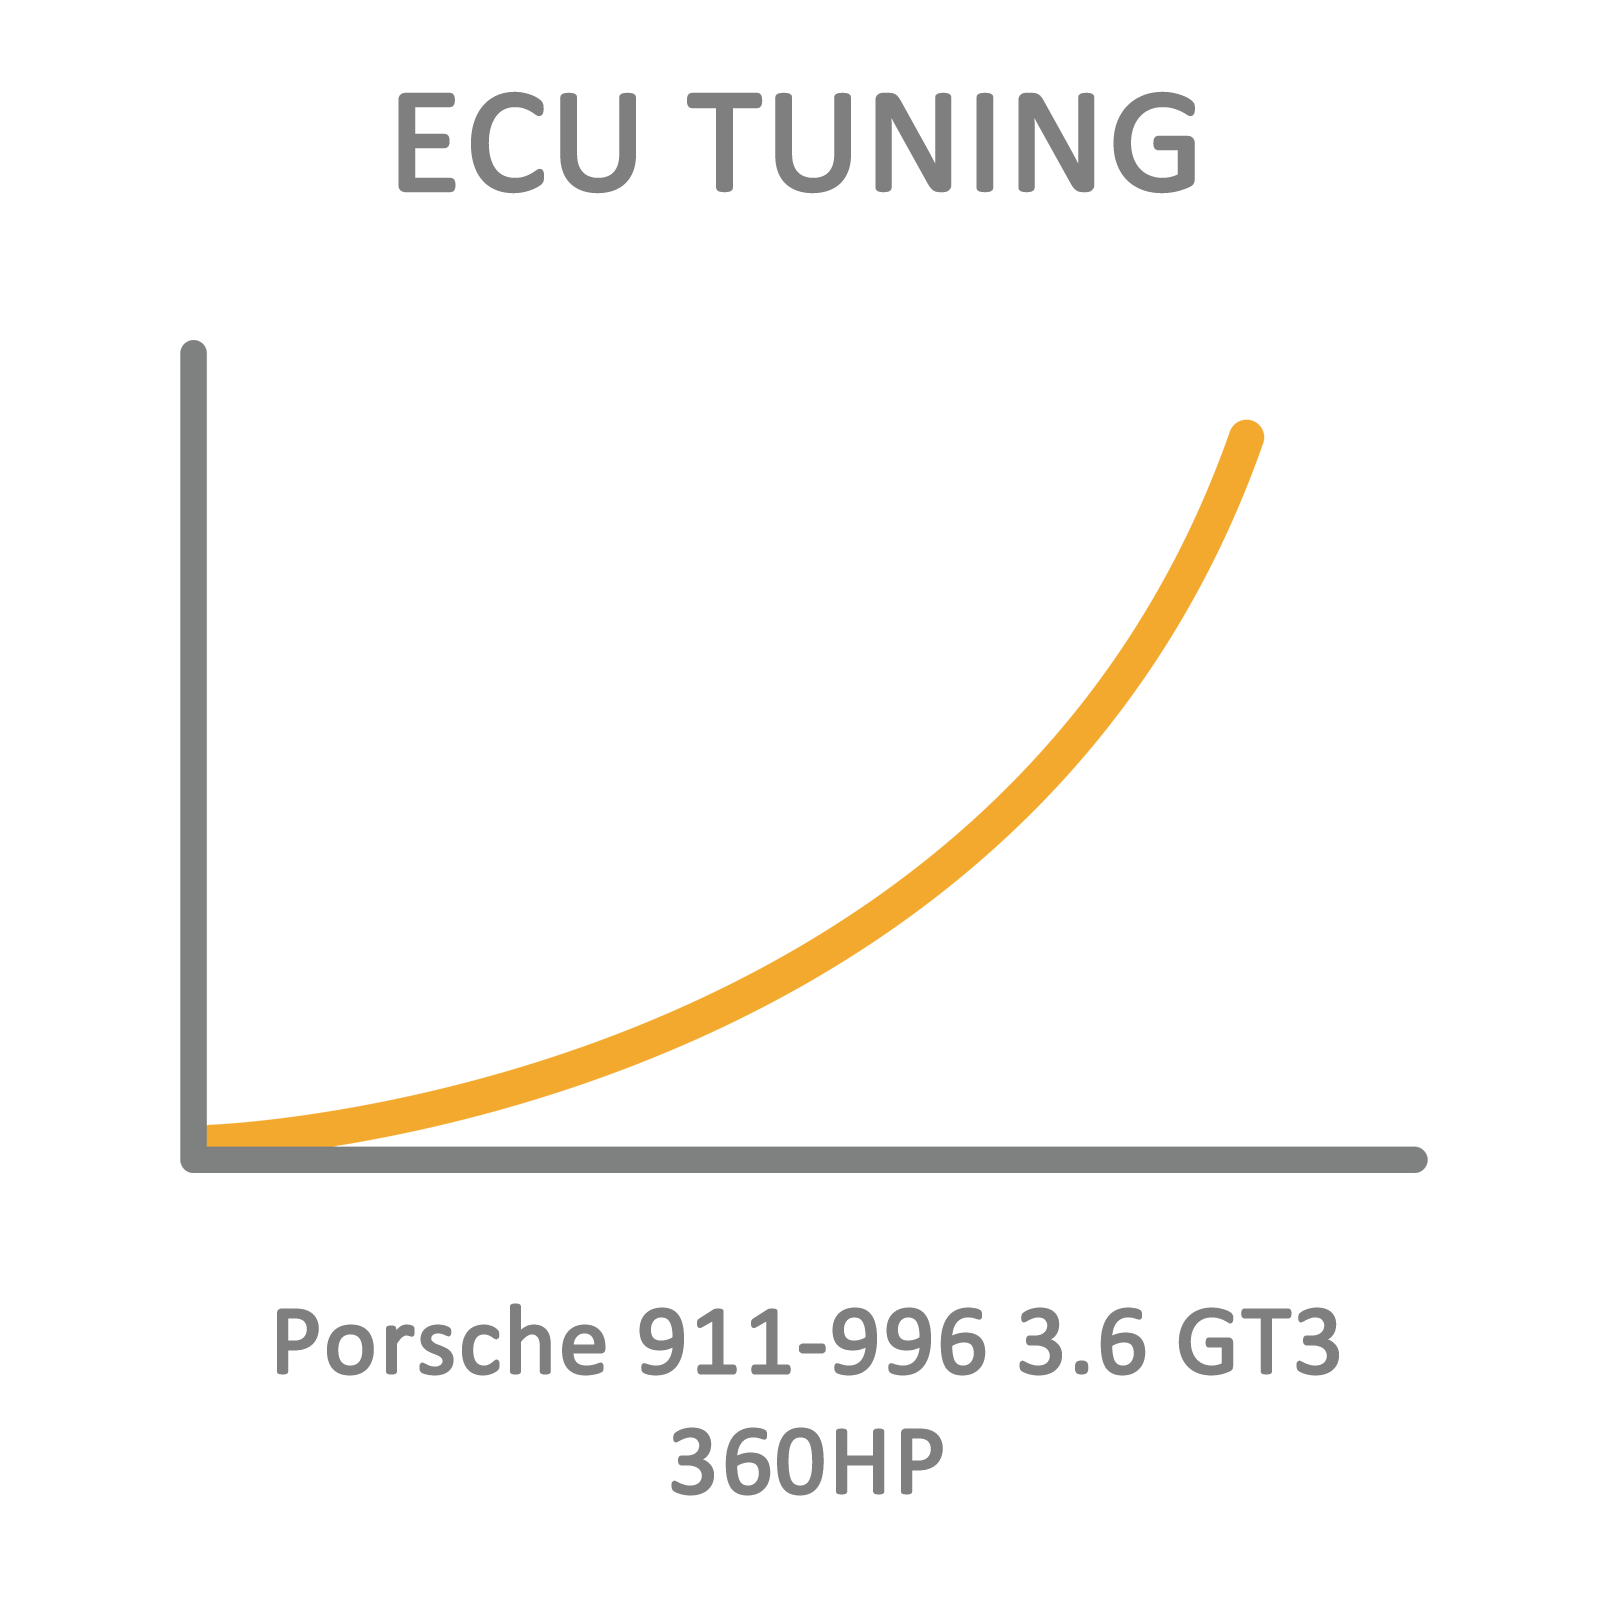 Porsche 911-996 3.6 GT3 360HP ECU Tuning Remapping Programming